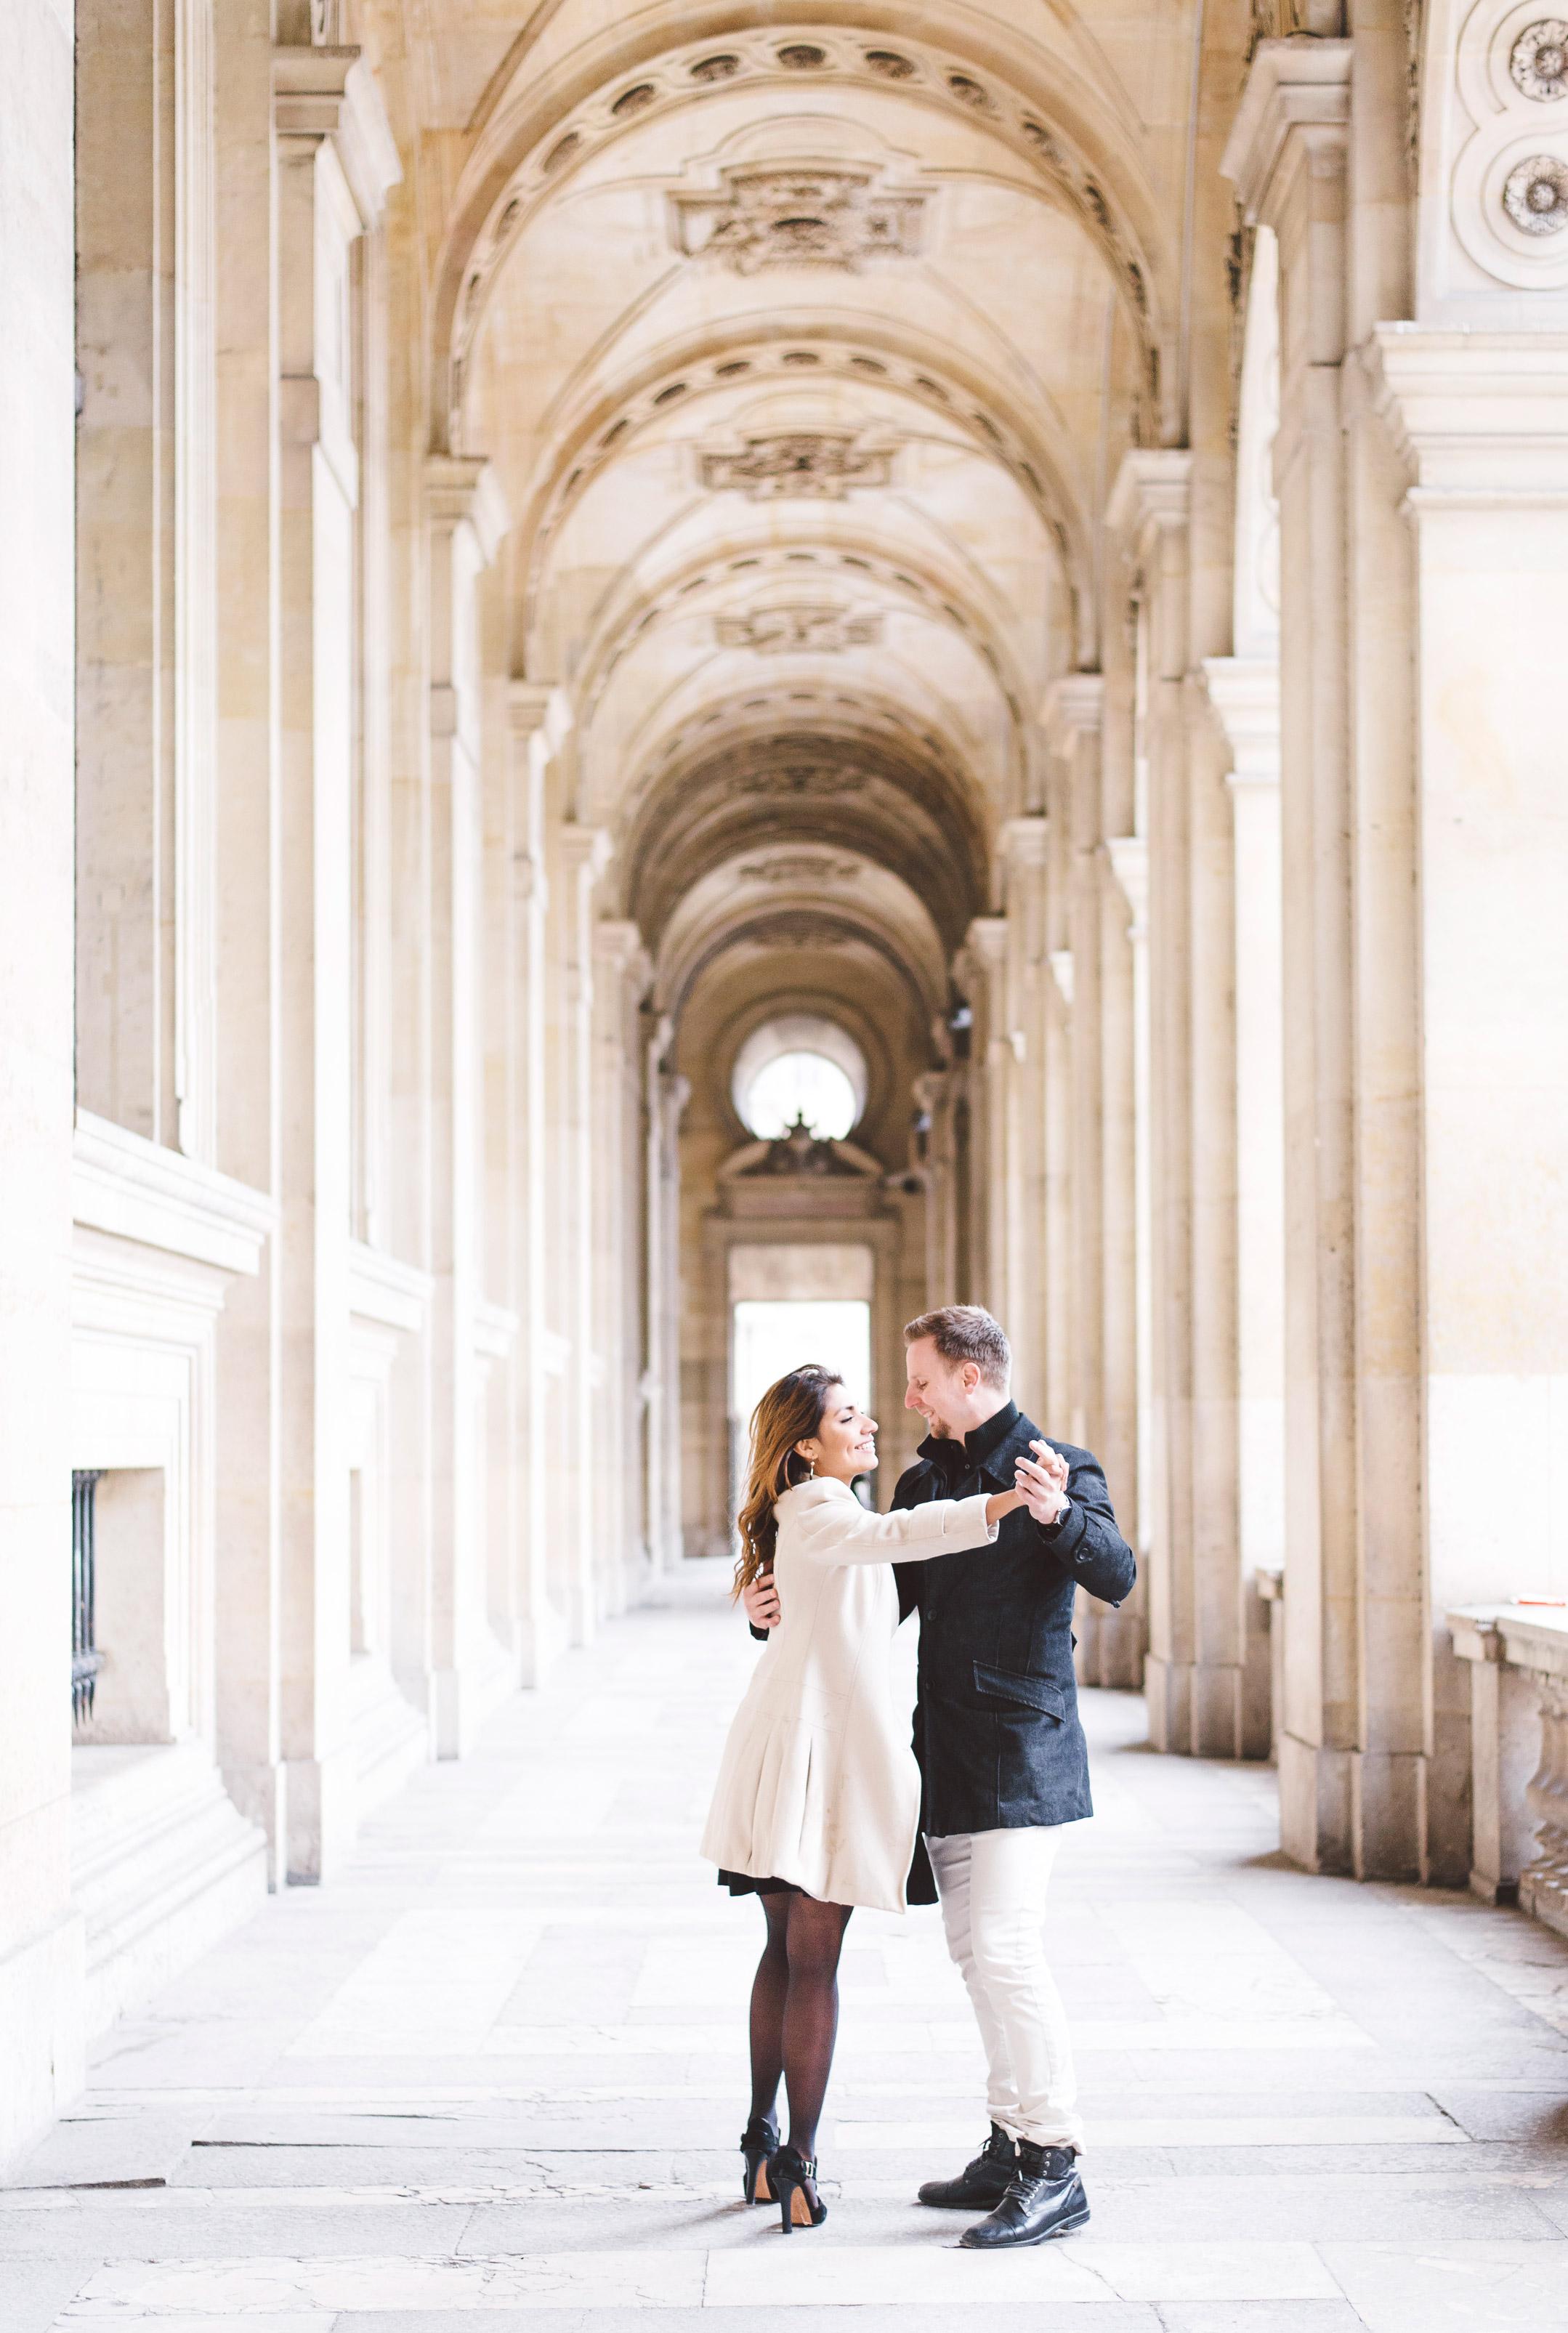 Couple-photoshoot-Anniversary-Paris-Louvre-Tuileries115.jpg